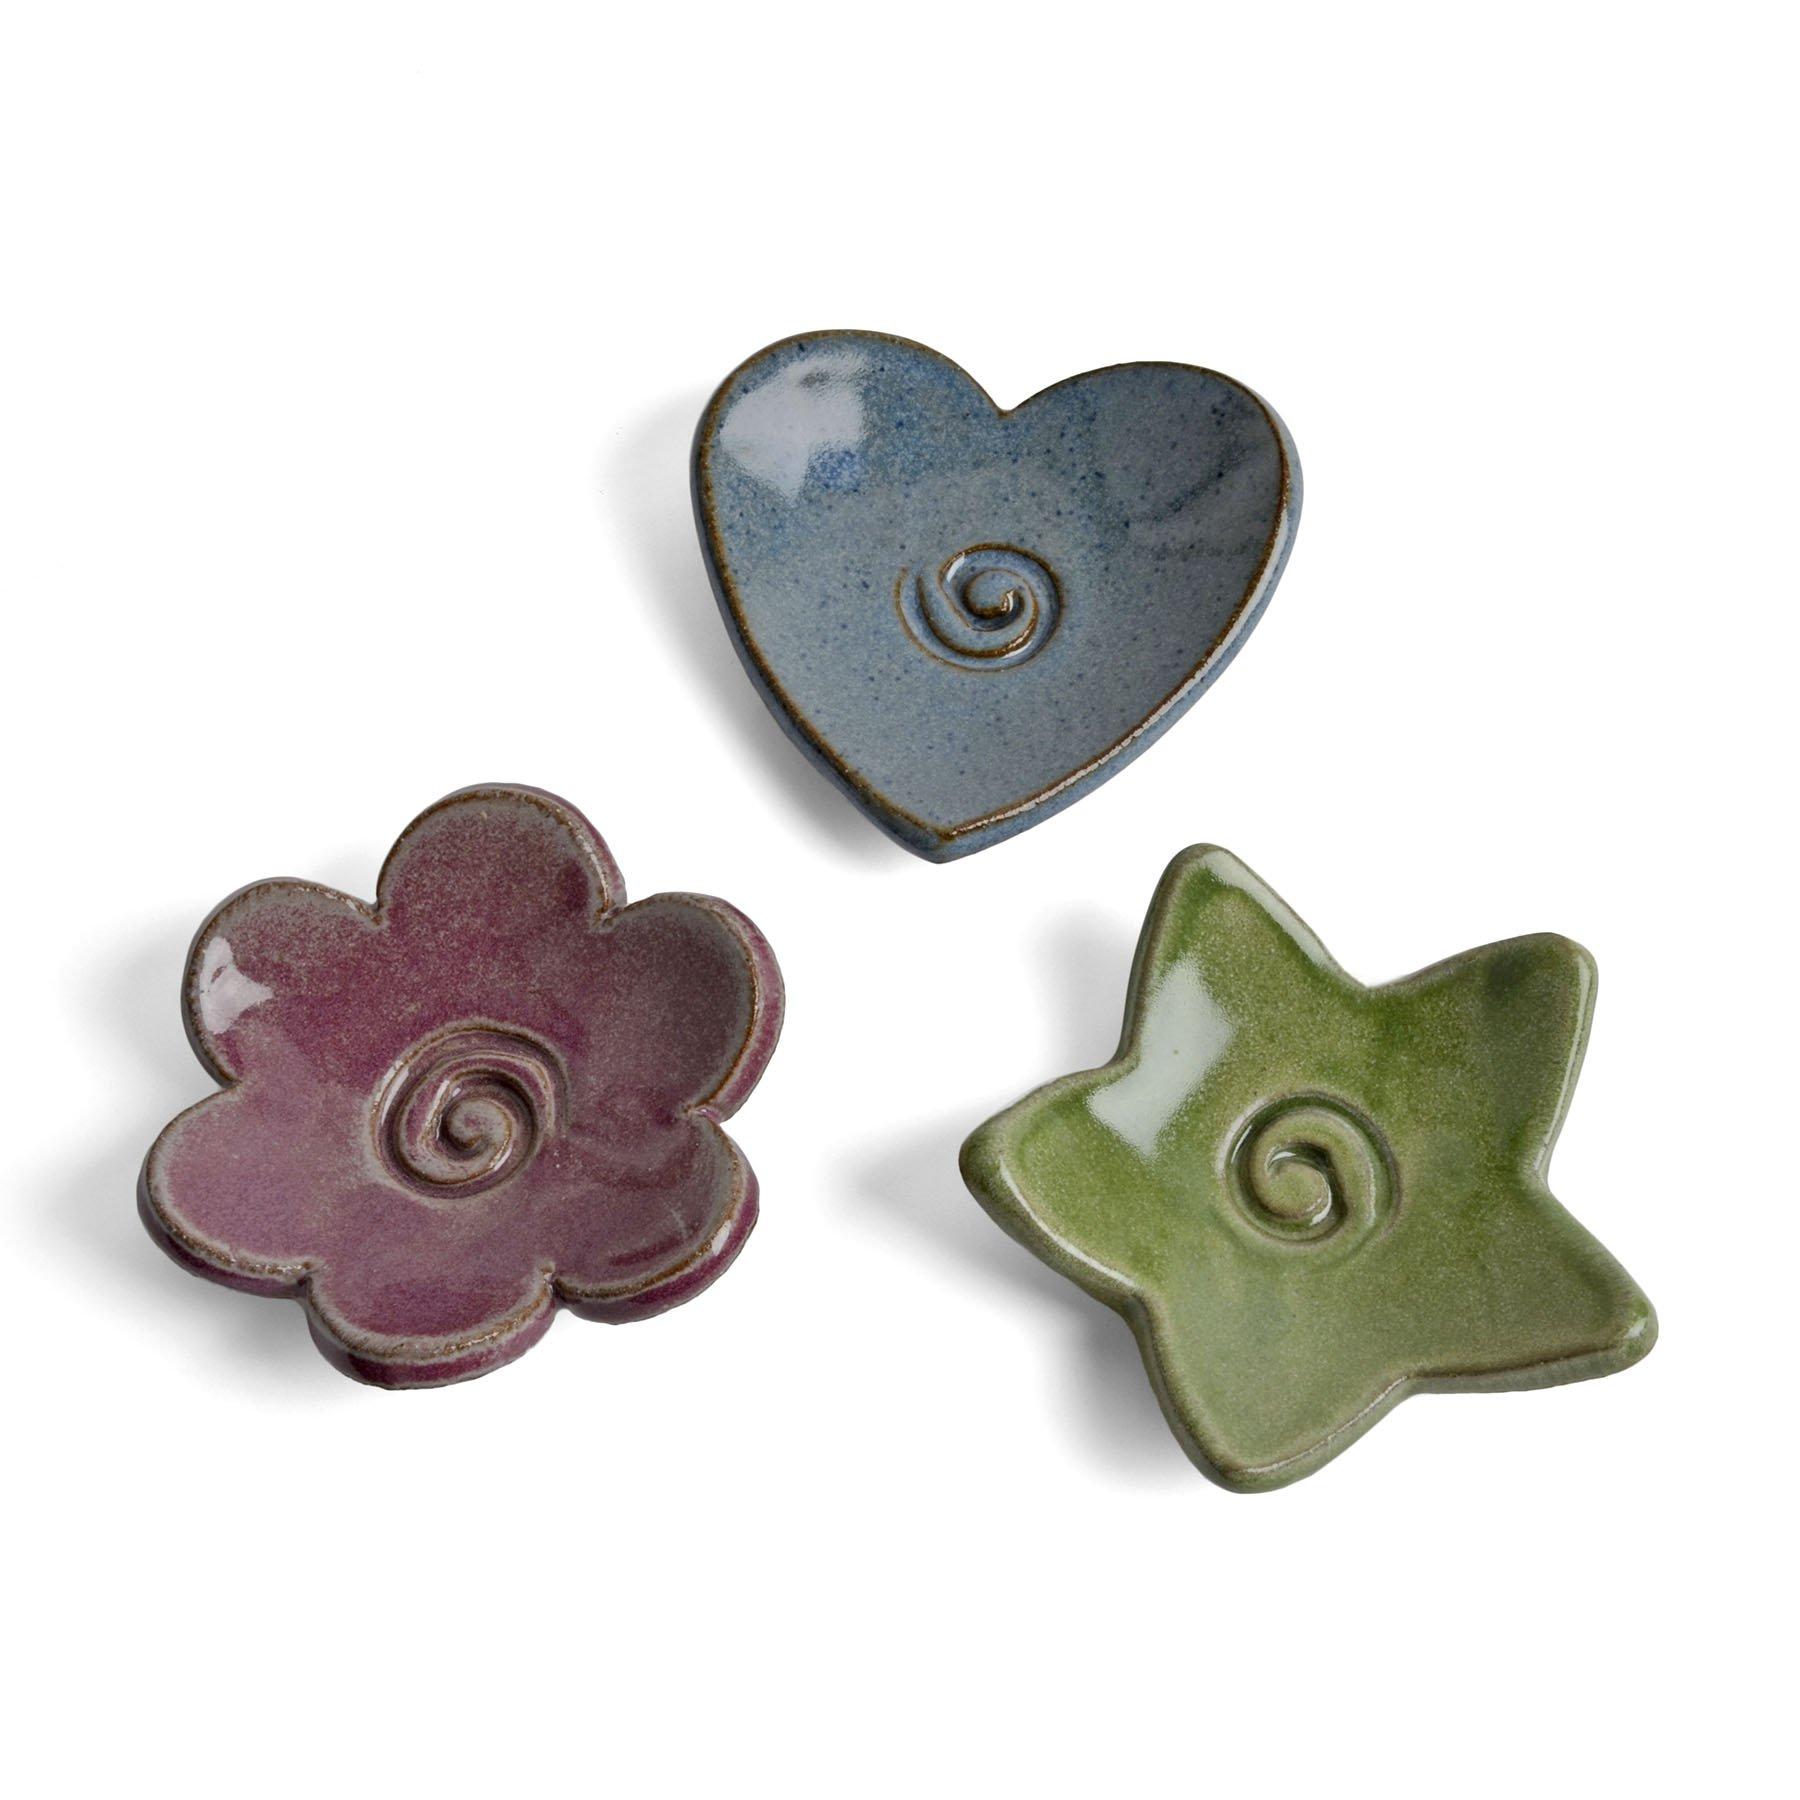 MudWorks Pottery Tea Bag Coasters Trinket Plates, Set of 3 by MudWorks Pottery